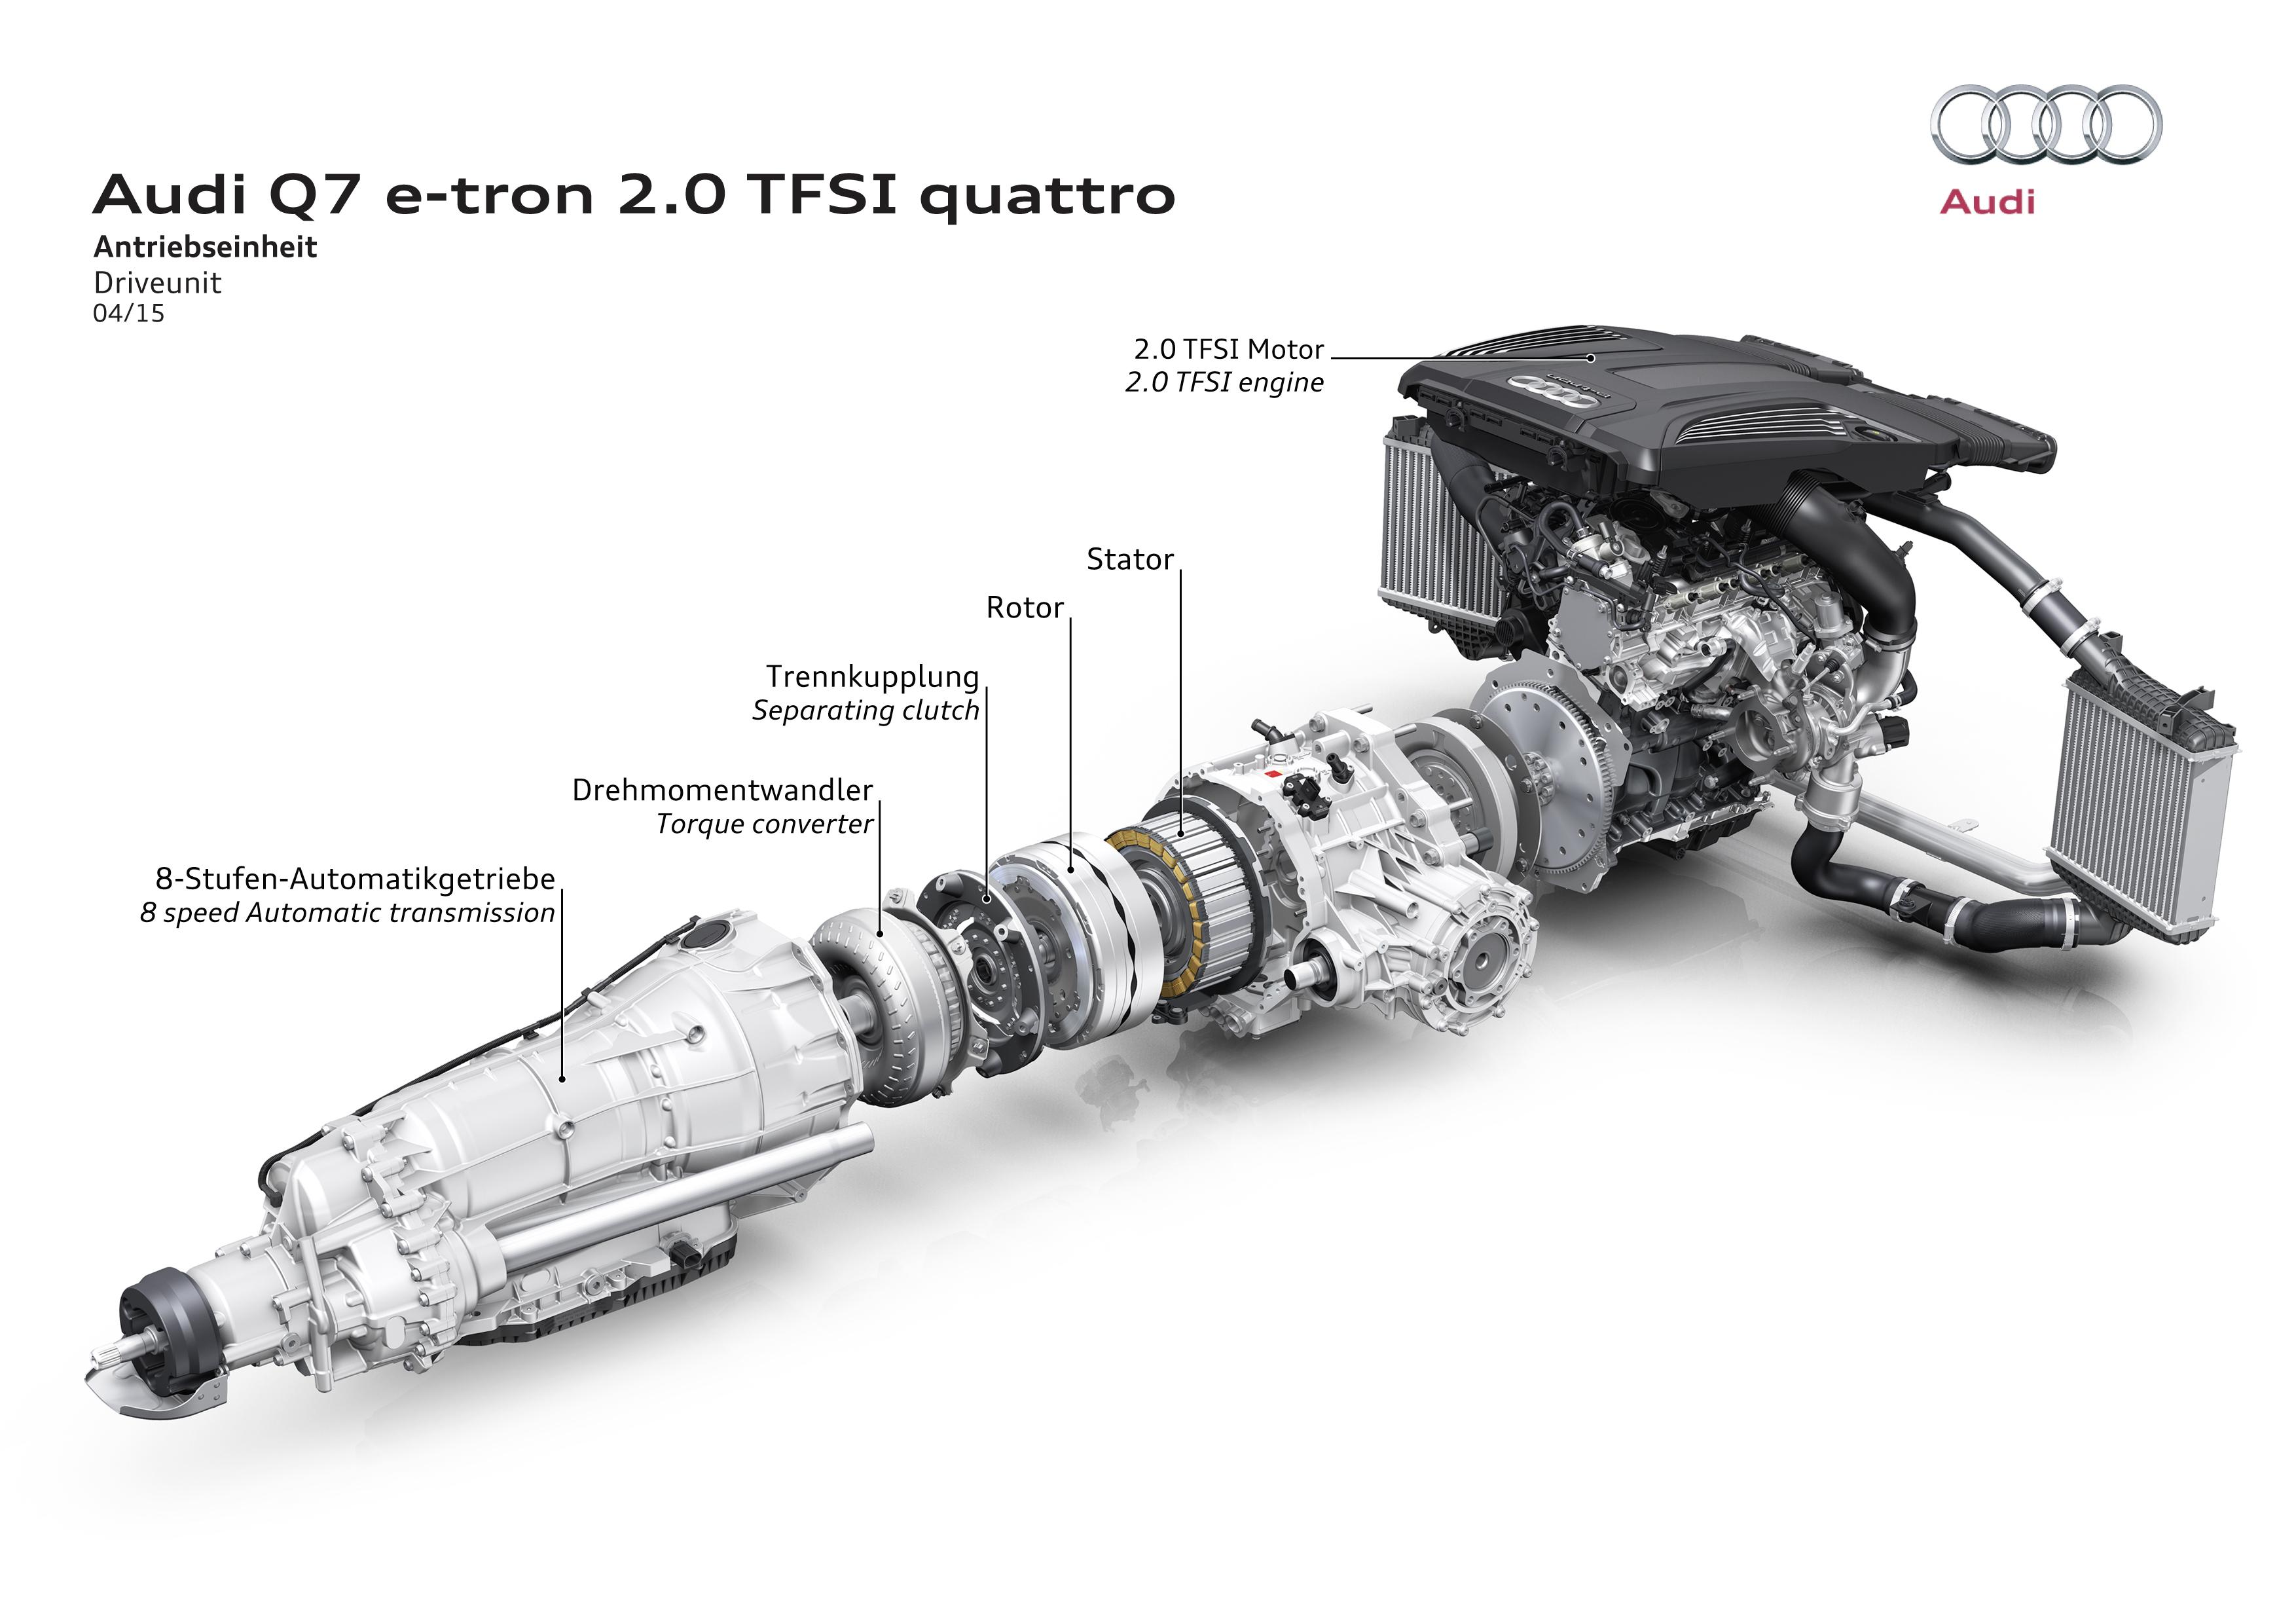 Audi Q7 e-tron 2.0 TFSI quattro - 2015 - gearbox driveunit engine